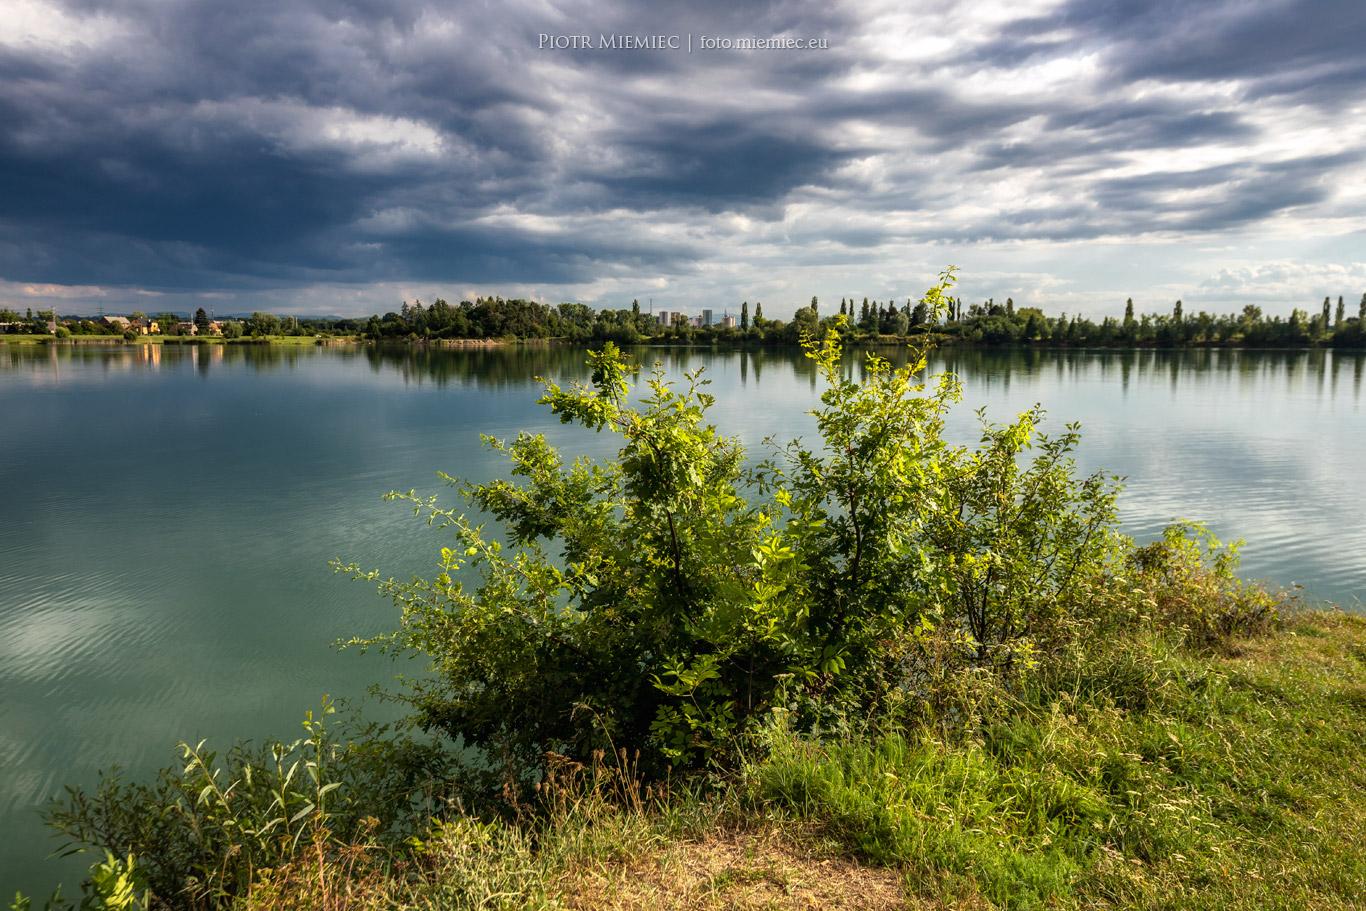 Kališovo jezero w Bohuminie